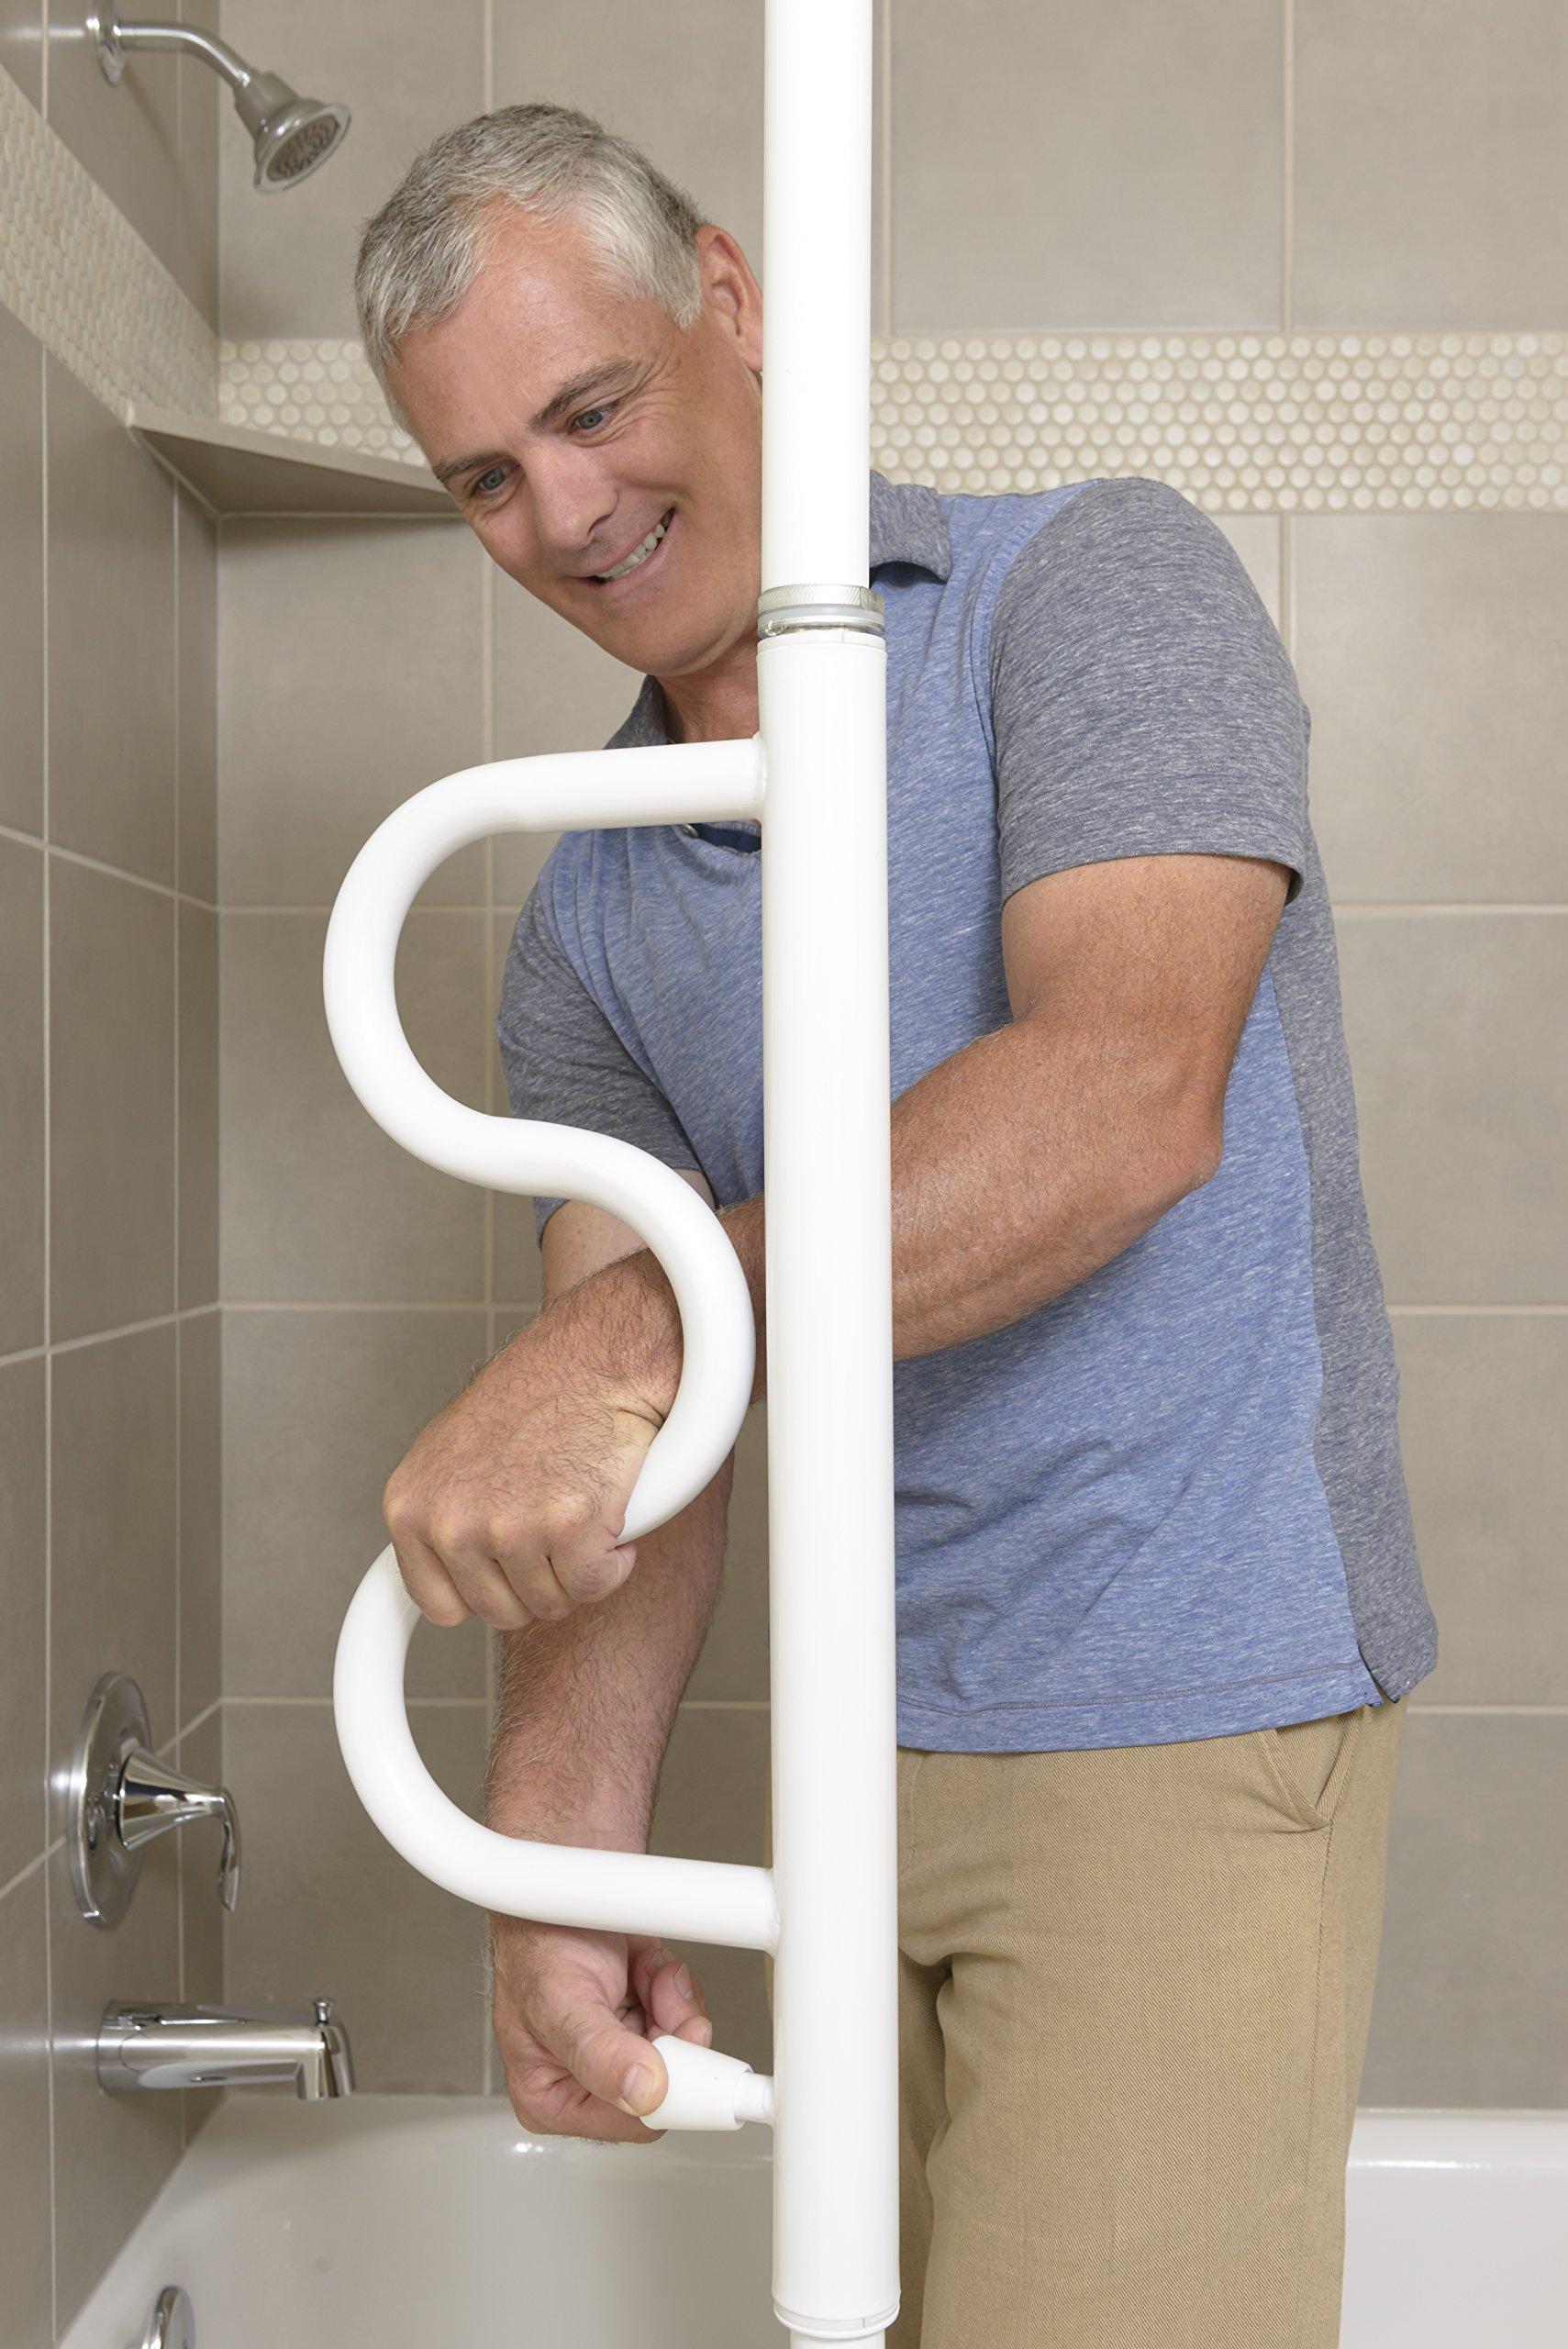 Stander Security Pole & Curve Grab Bar - Elderly Tension Mounted Transfer Pole + Bathroom Assist Grab Bar - Iceberg White by Stander (Image #5)